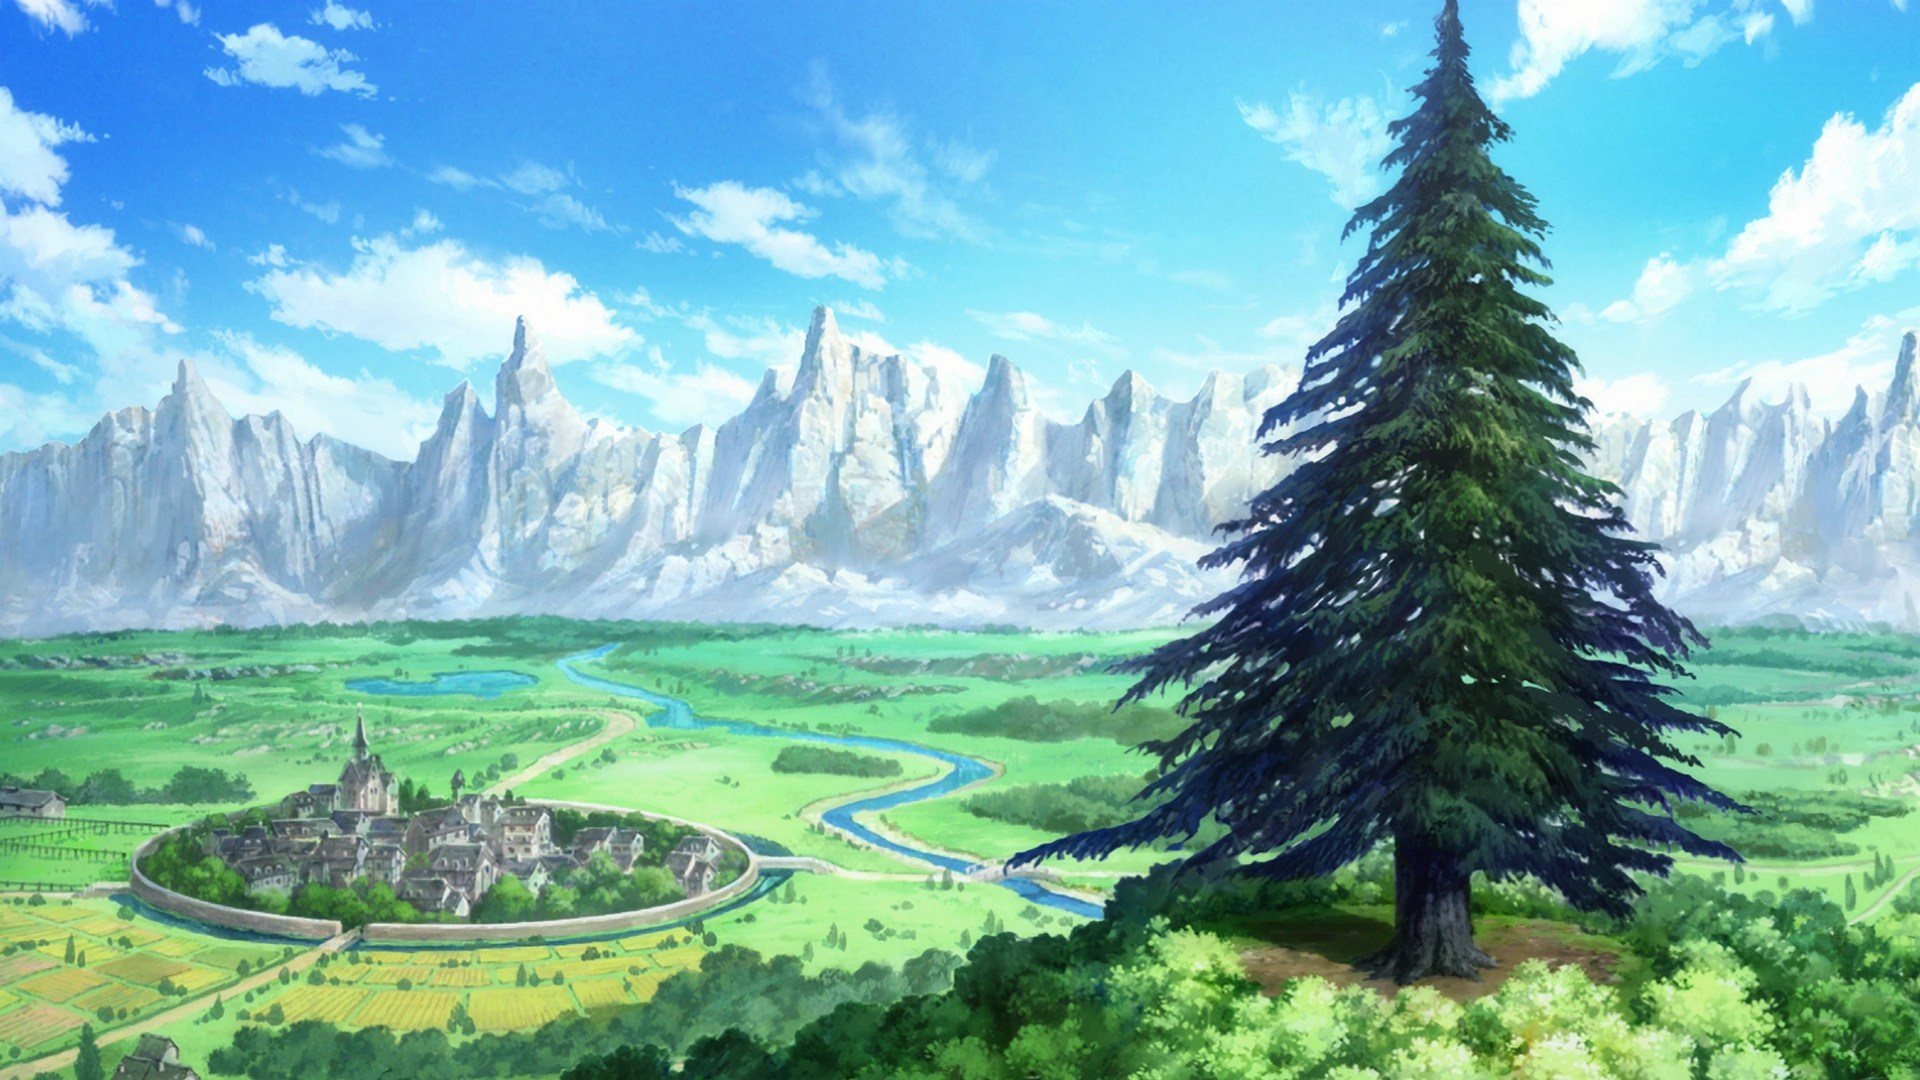 New Fall Creator Wallpaper Sword Art Online Alicization Episode 01 Sword Art Online